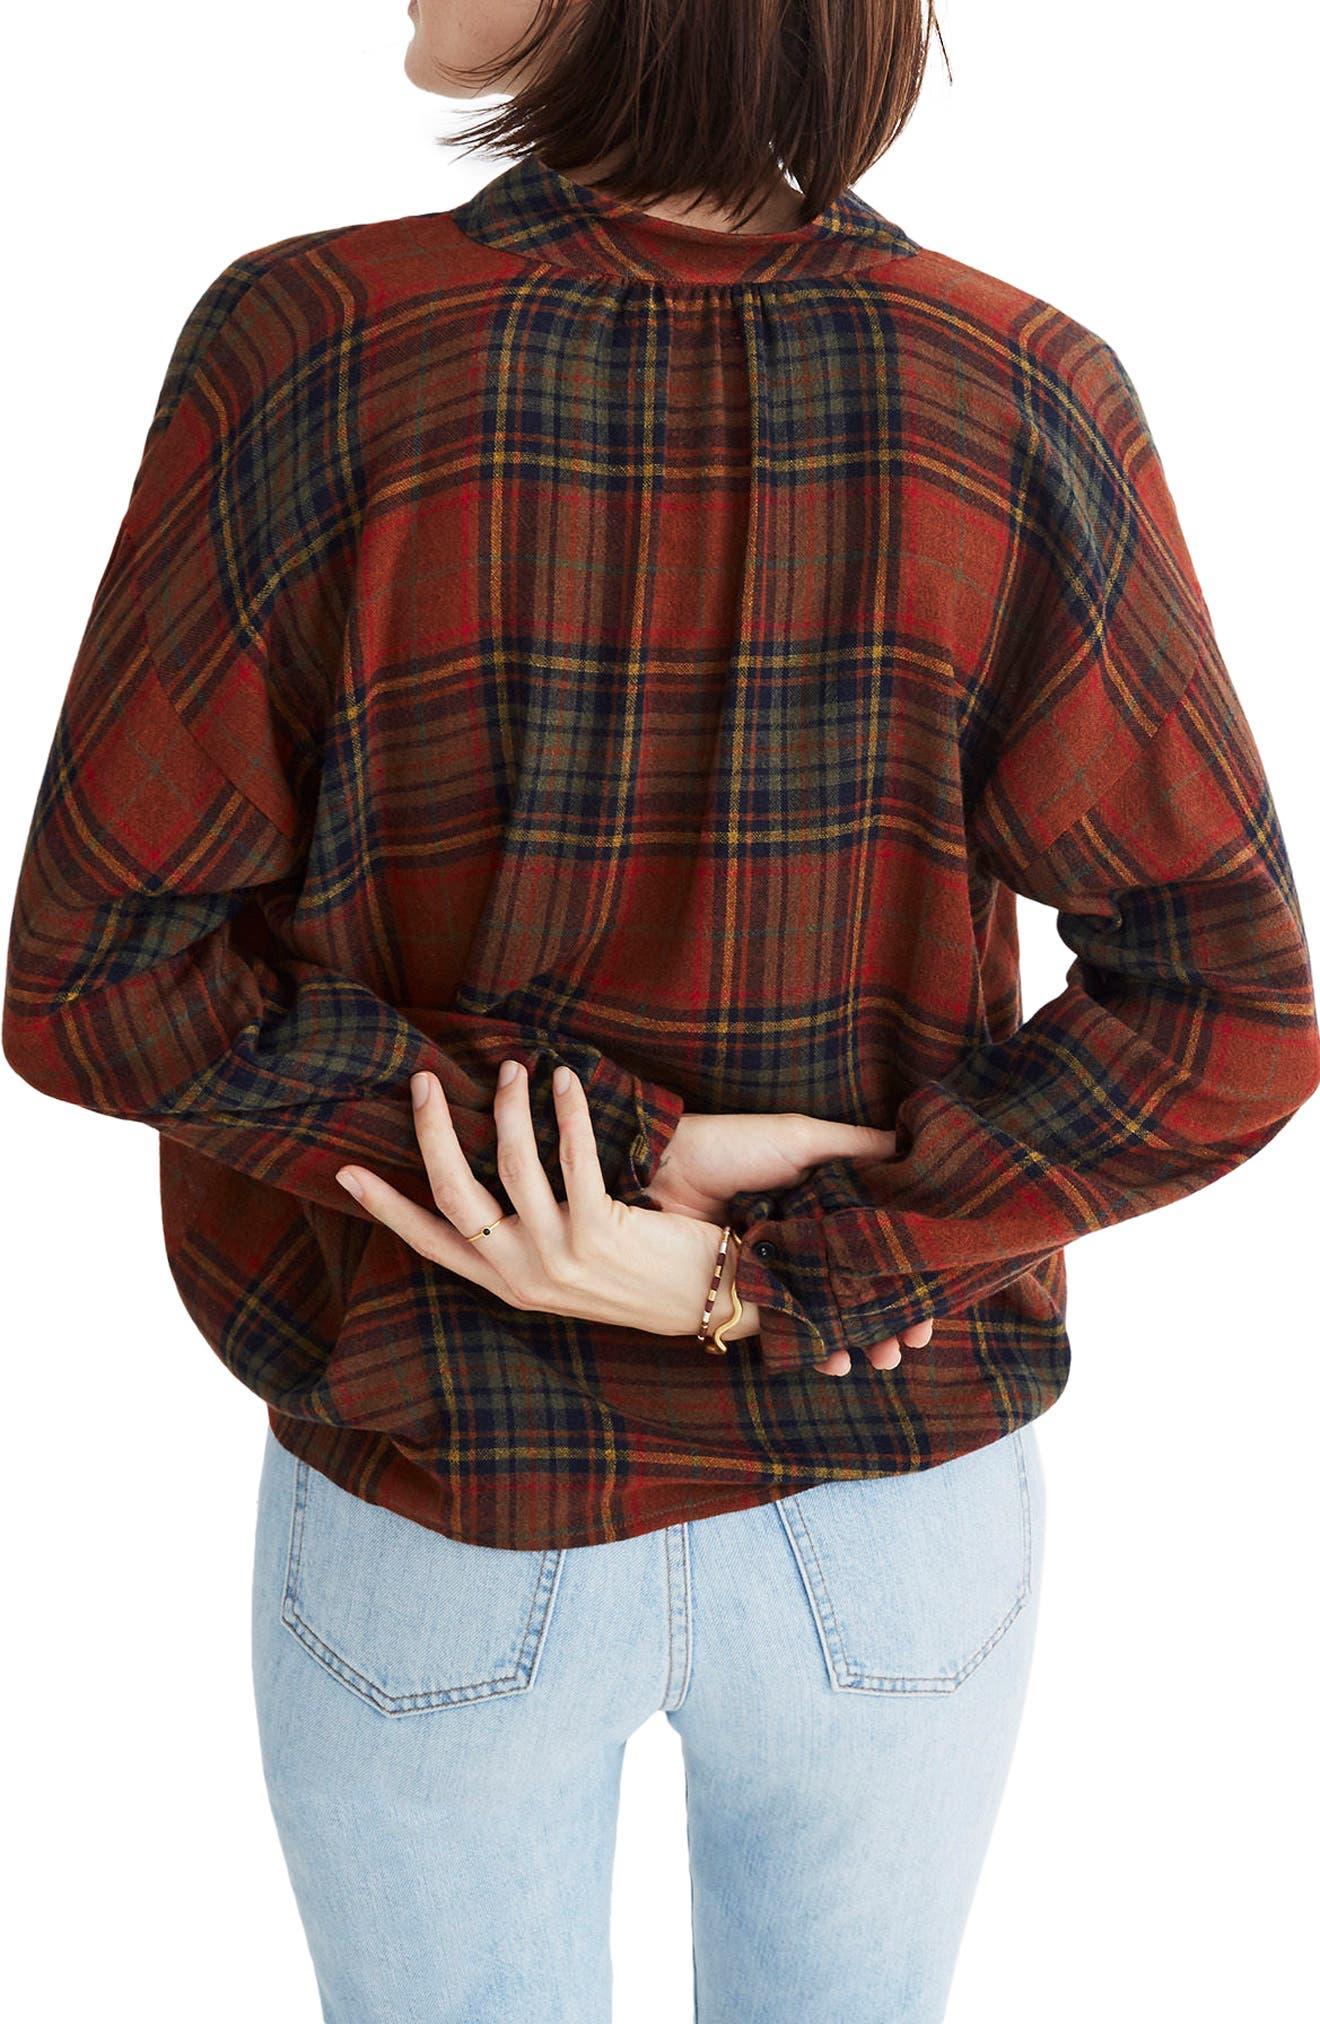 Highroad Plaid Popover Shirt,                             Alternate thumbnail 2, color,                             800